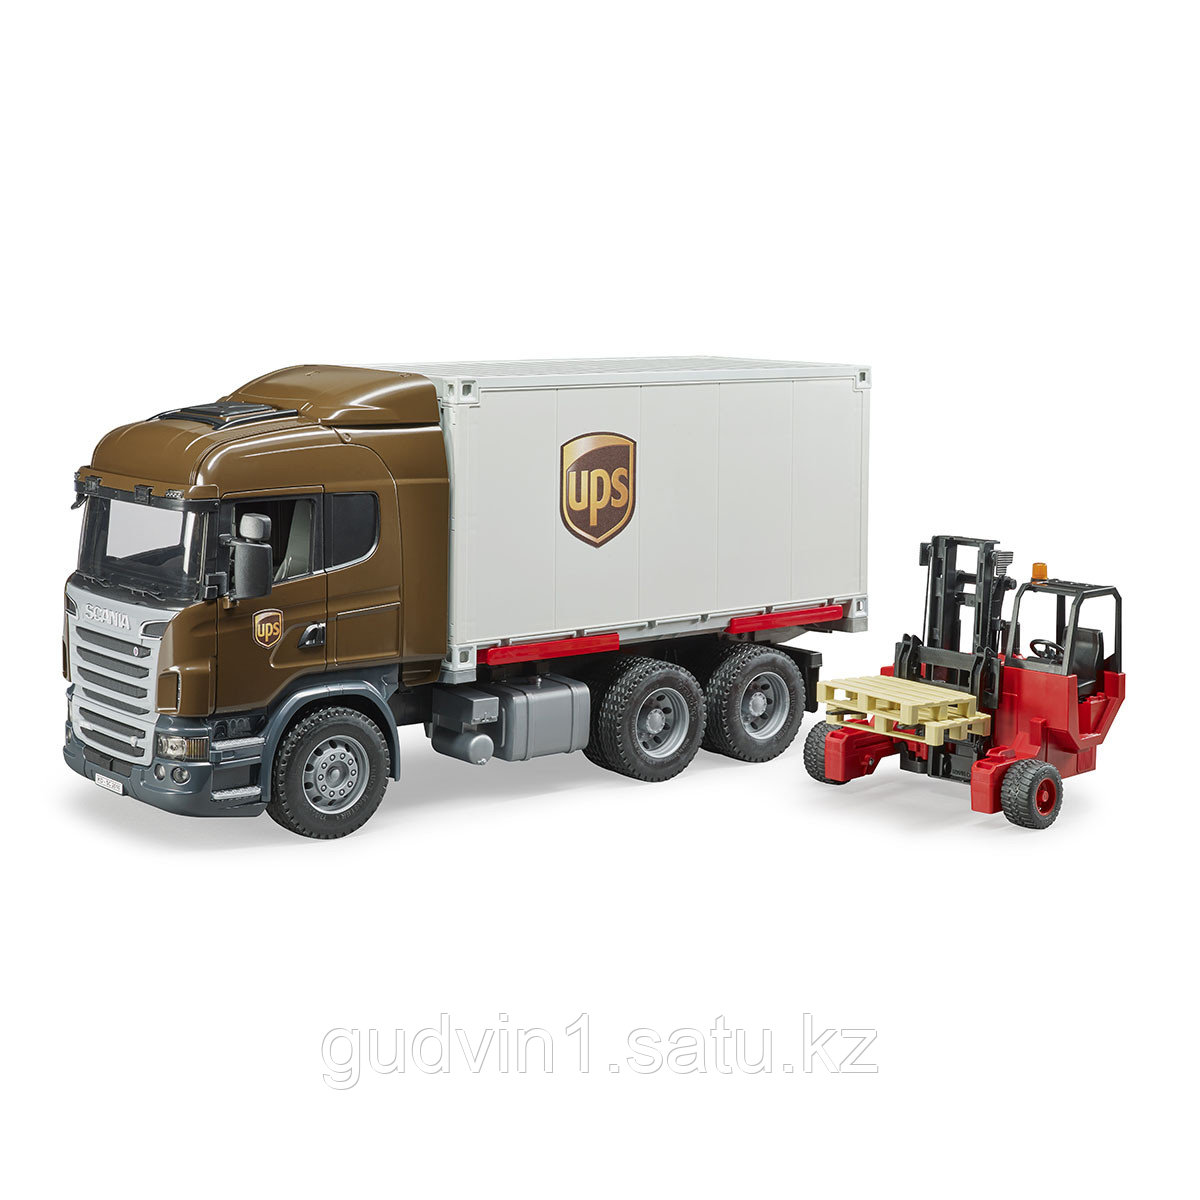 Scania фургон UPS Bruder с погрузчиком и паллетами 03-581